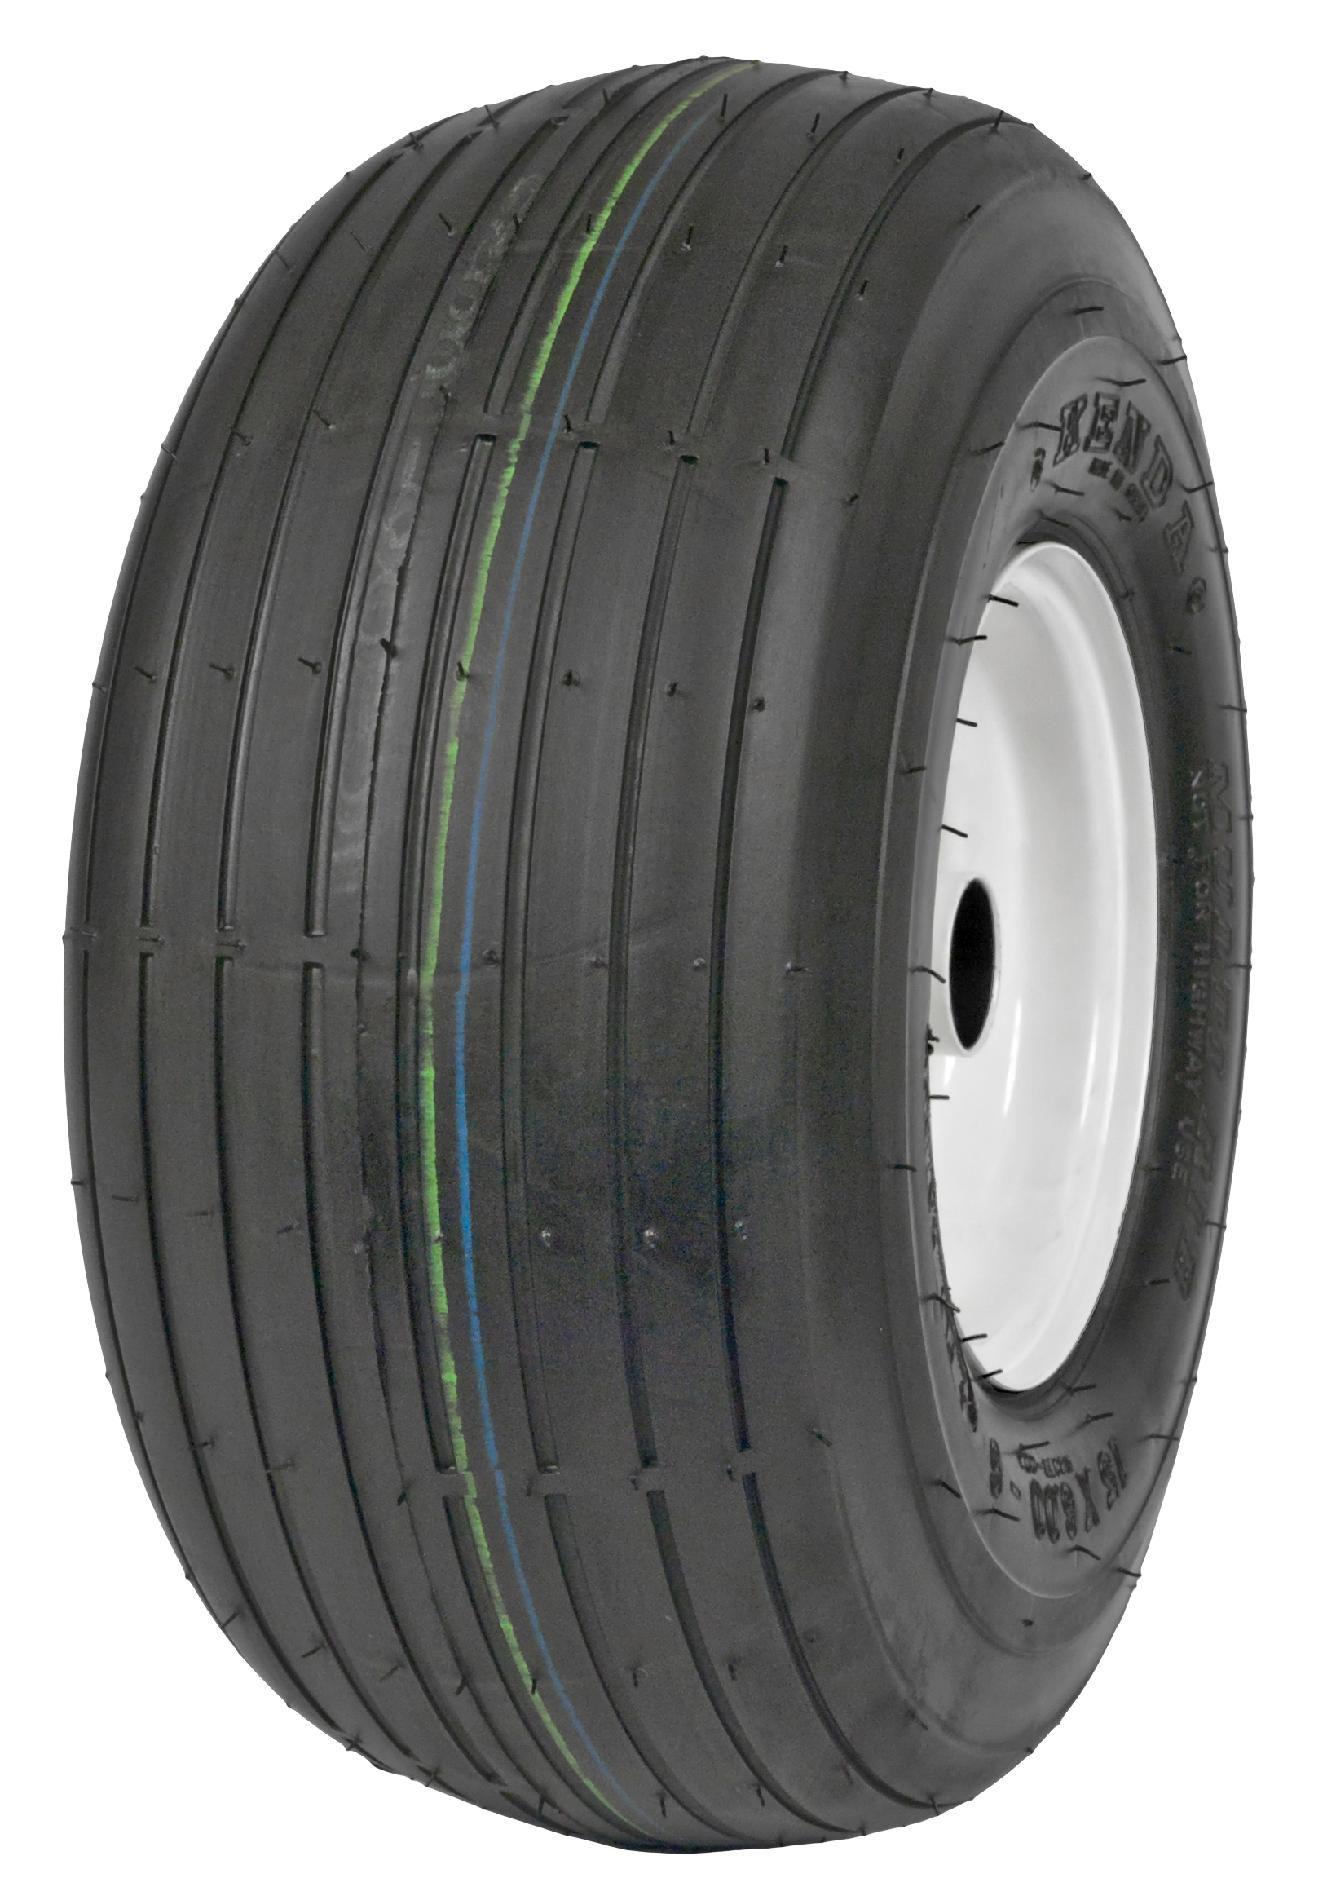 Image of KENDA 506-2R-I 13X500-6 Rib Turf Tire